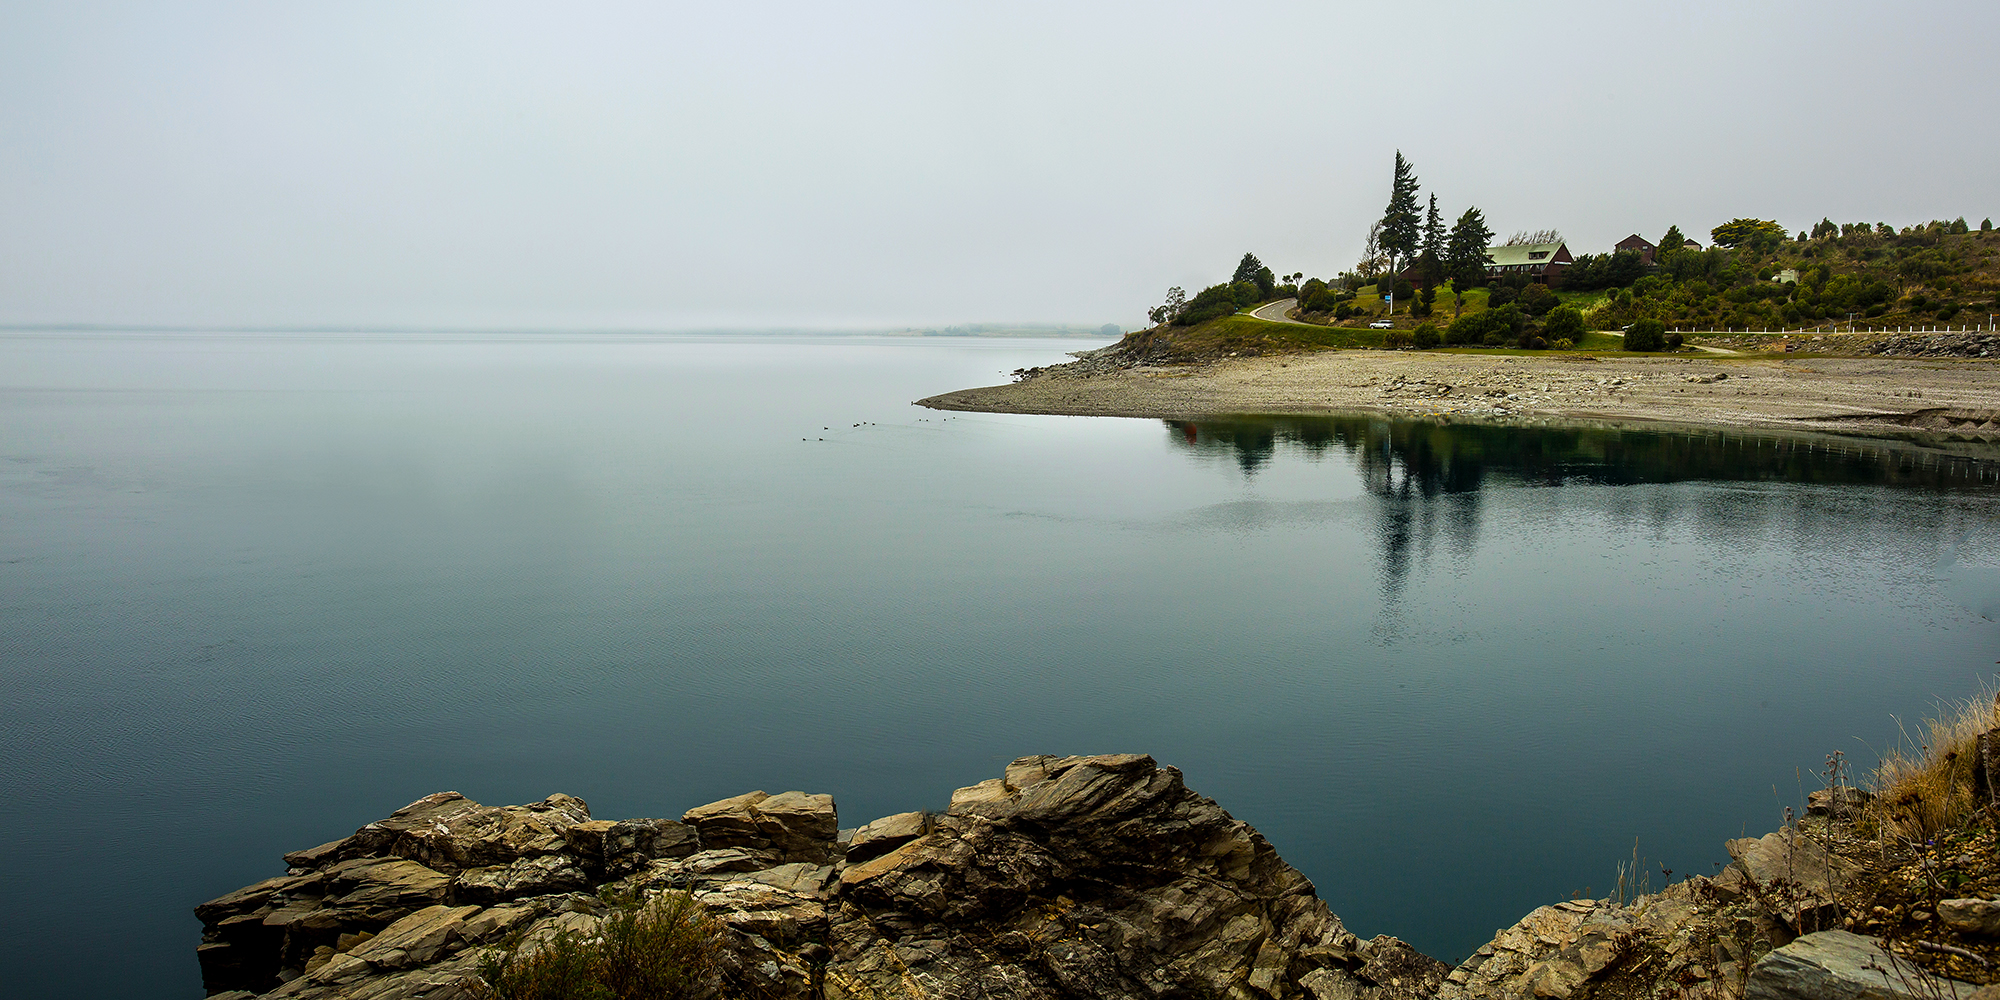 Foggy Day at Lake Hawea